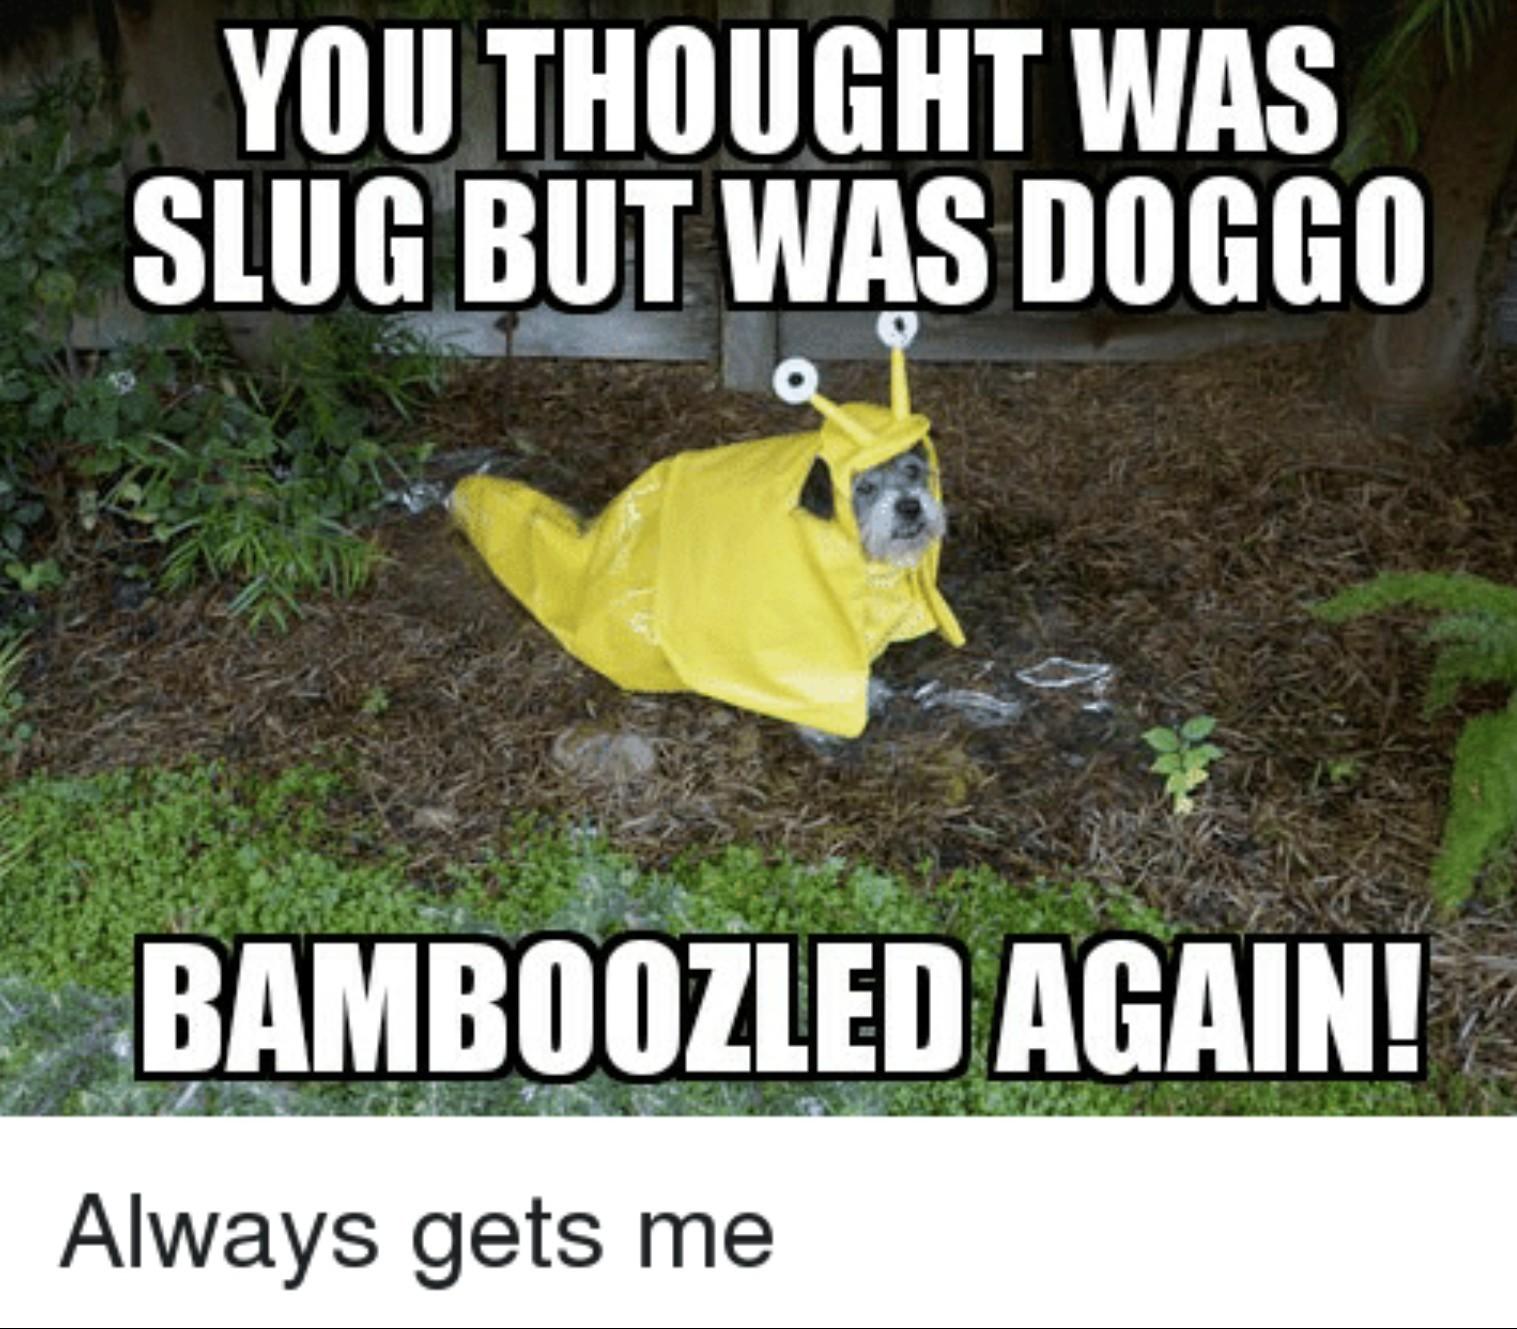 Sluggo or doggo? D'sloggo. - meme